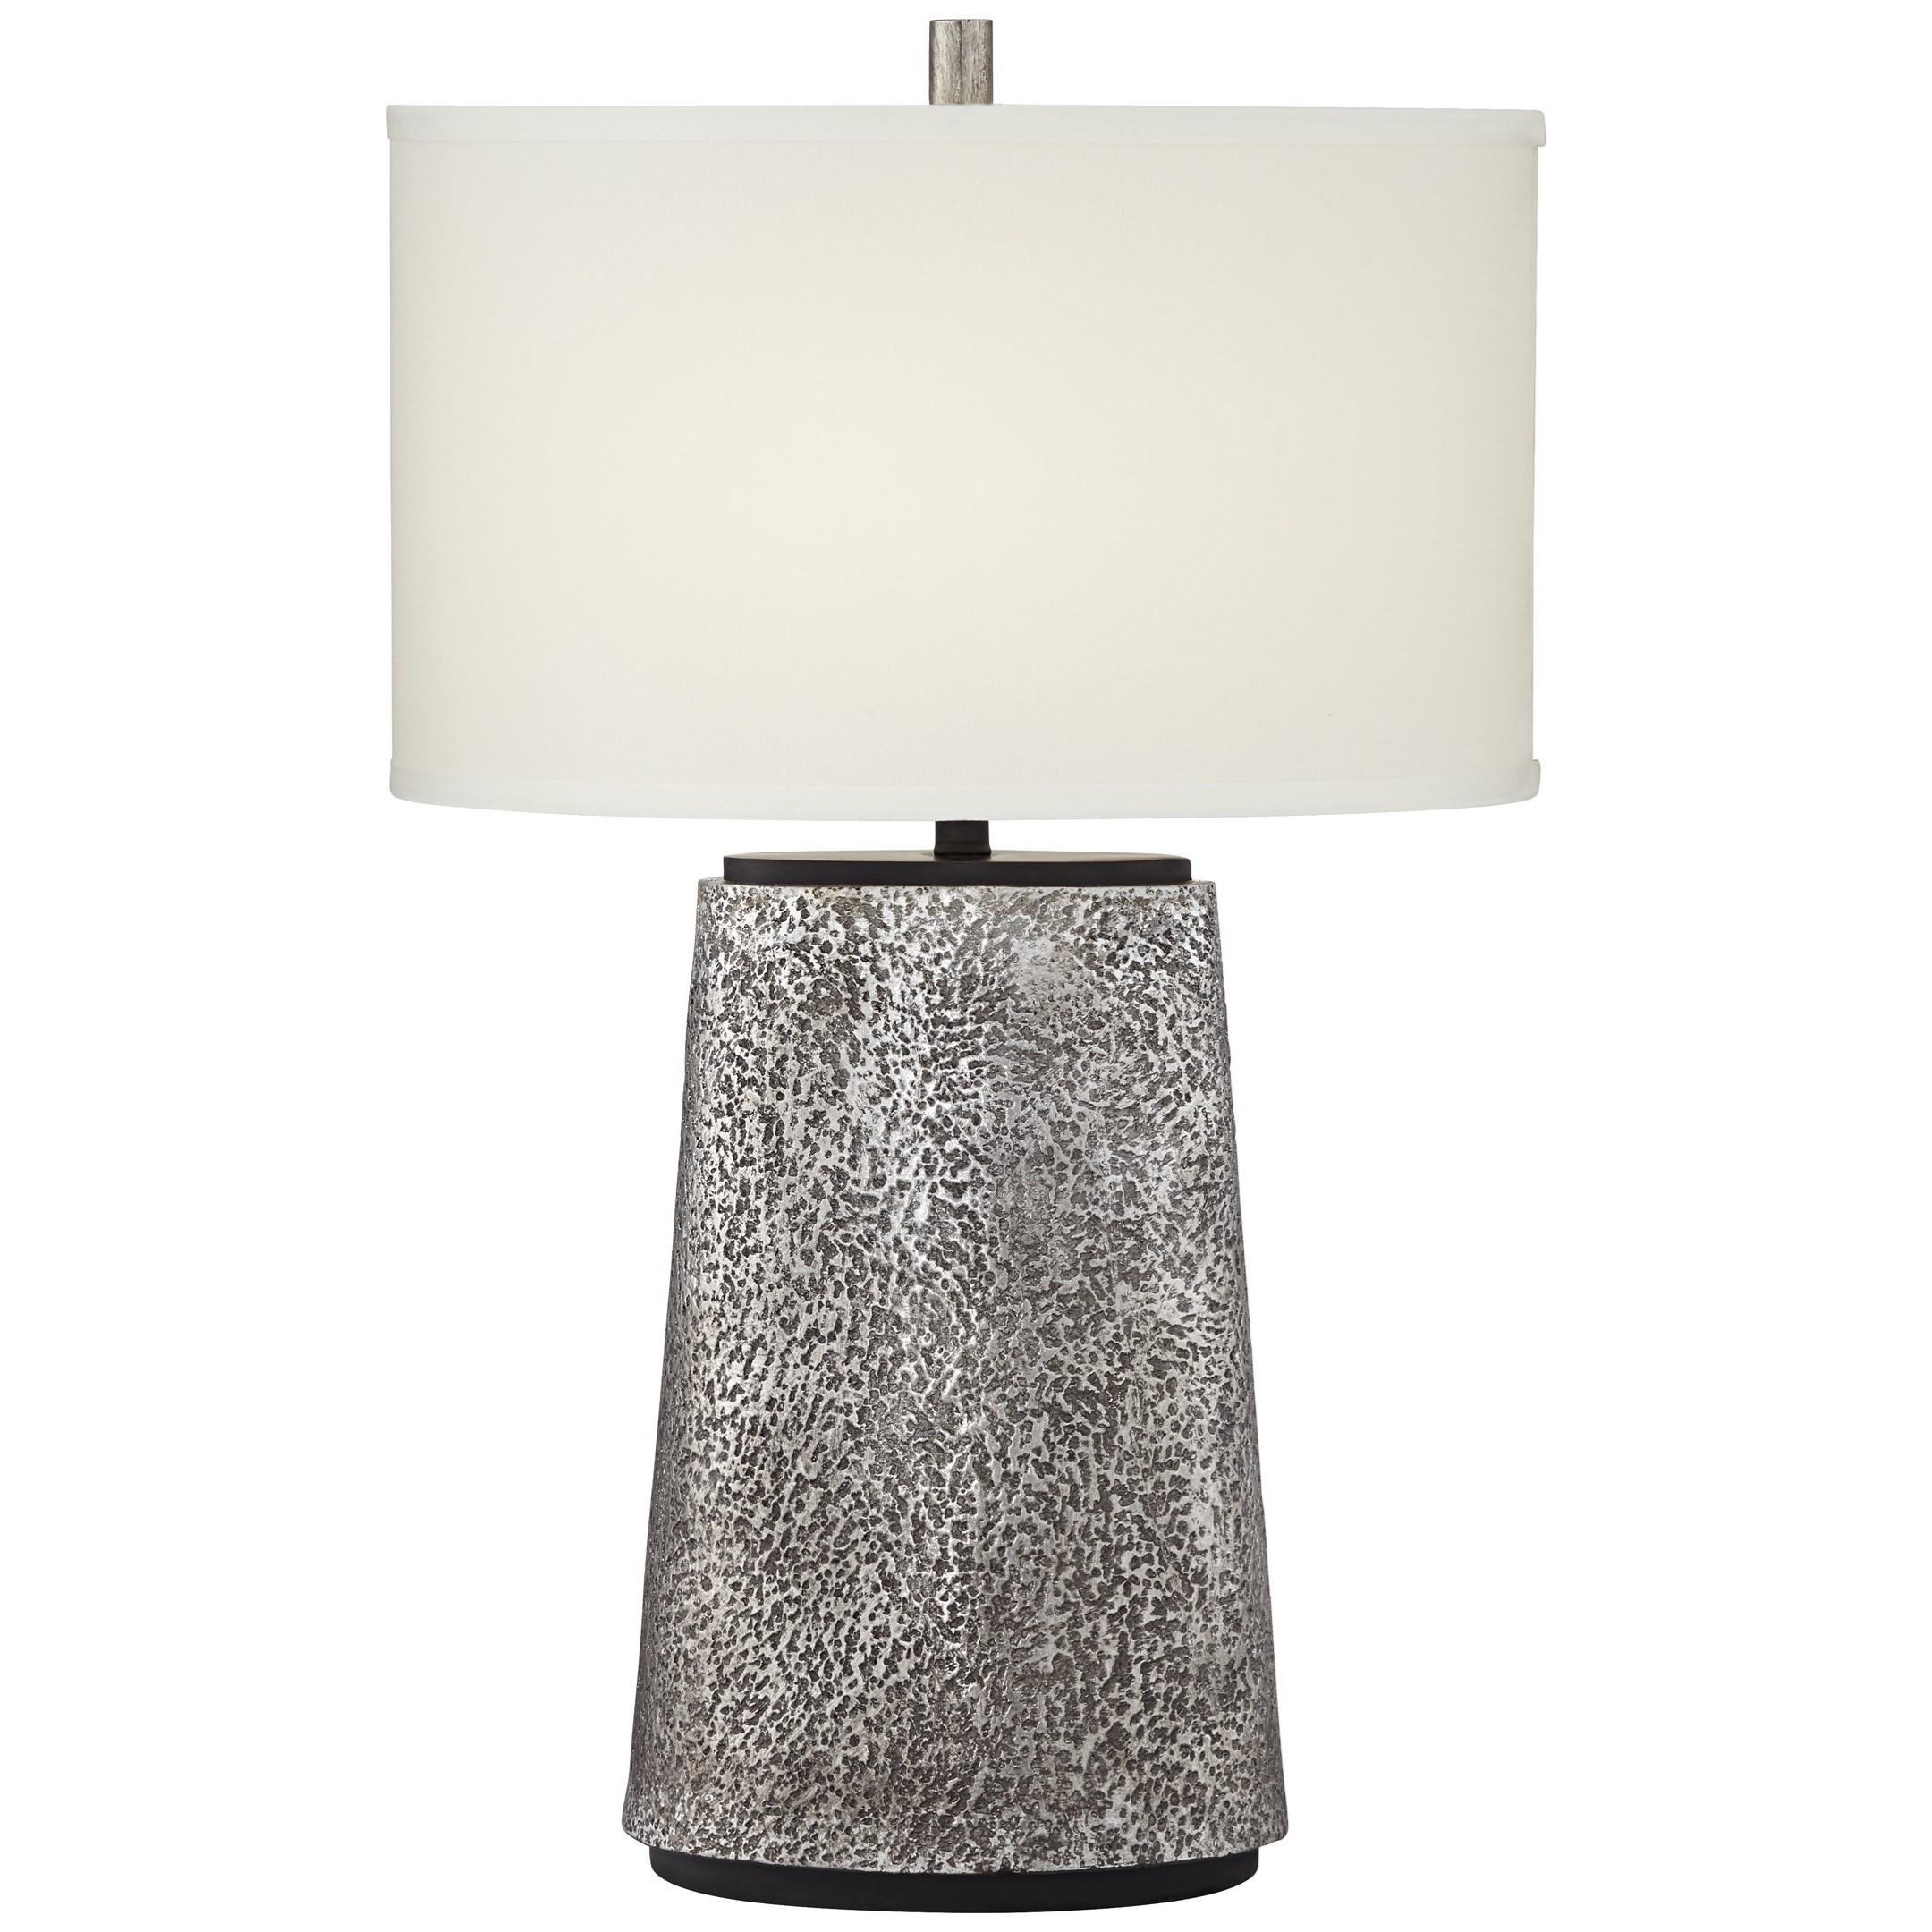 Table Lamps Kathy Ireland Lamp